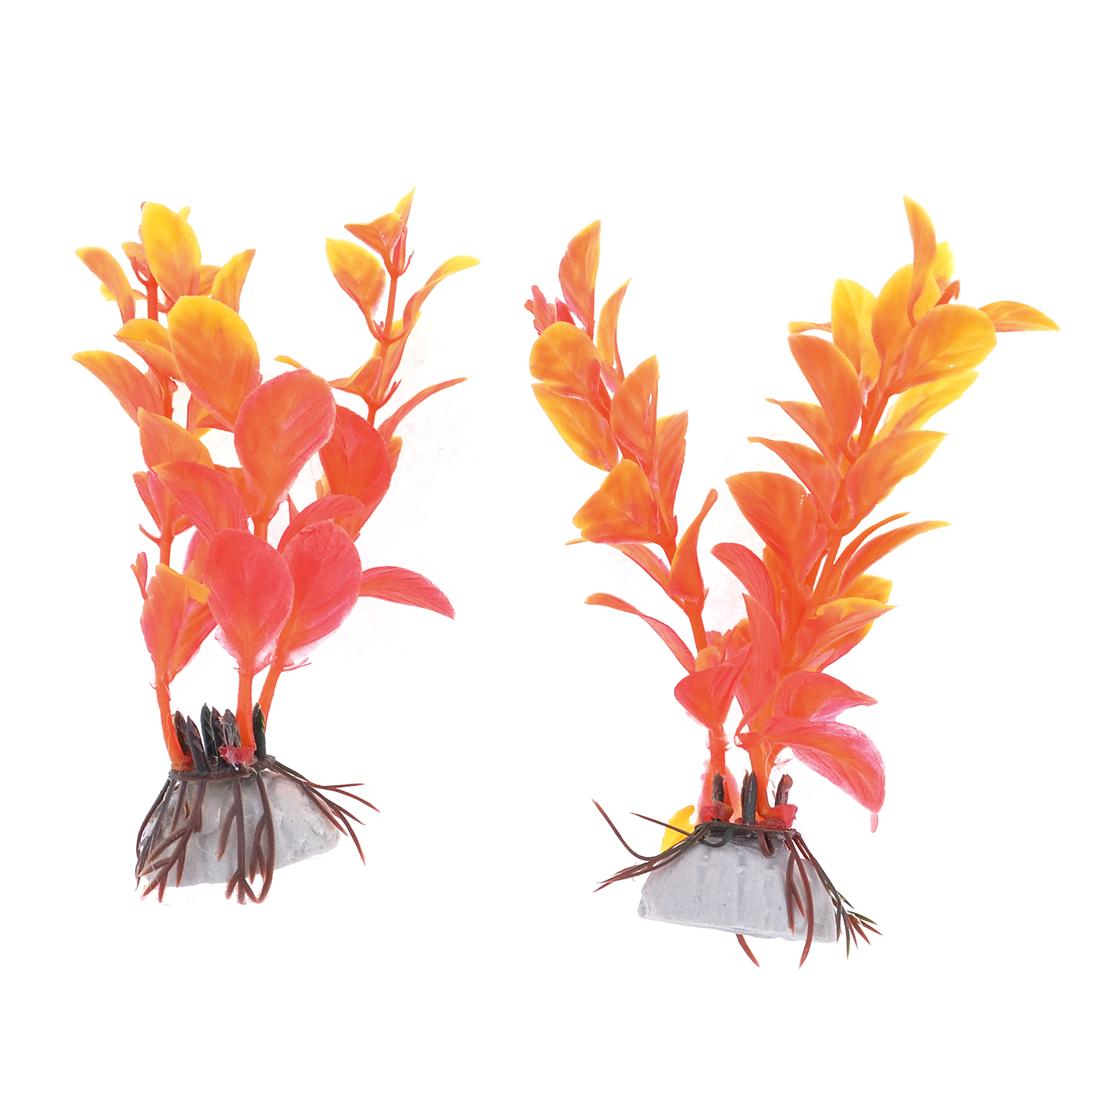 "Aquarium Landscaping Orangered 4.3"" Long Oval Leaf Plastic Plants 2 Pcs"